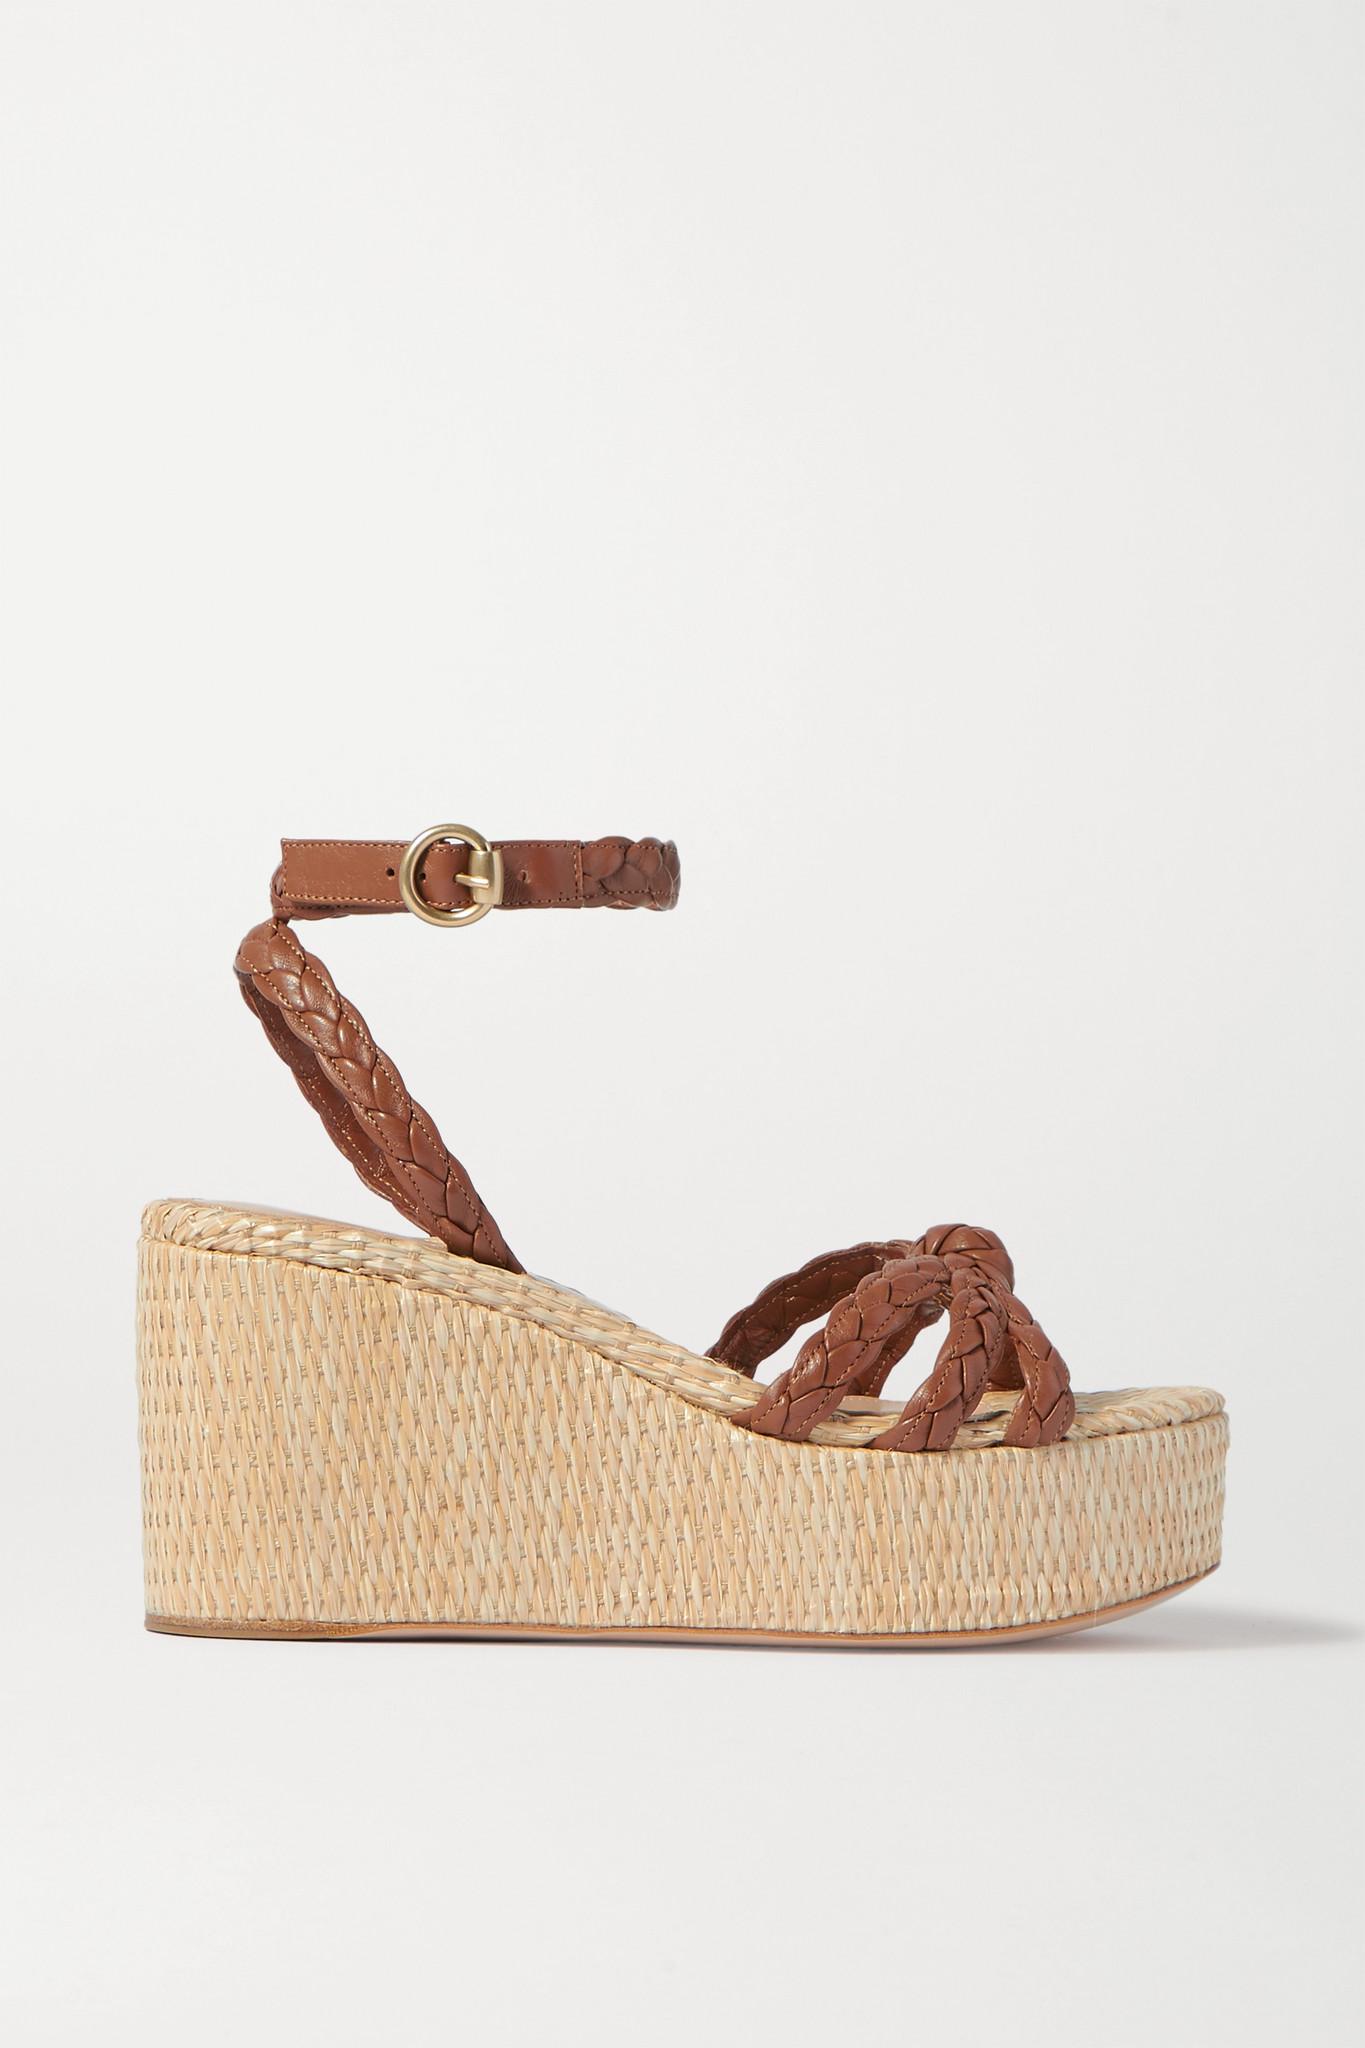 GIANVITO ROSSI - 80 麻花编织皮革坡跟凉鞋 - 棕色 - IT38.5